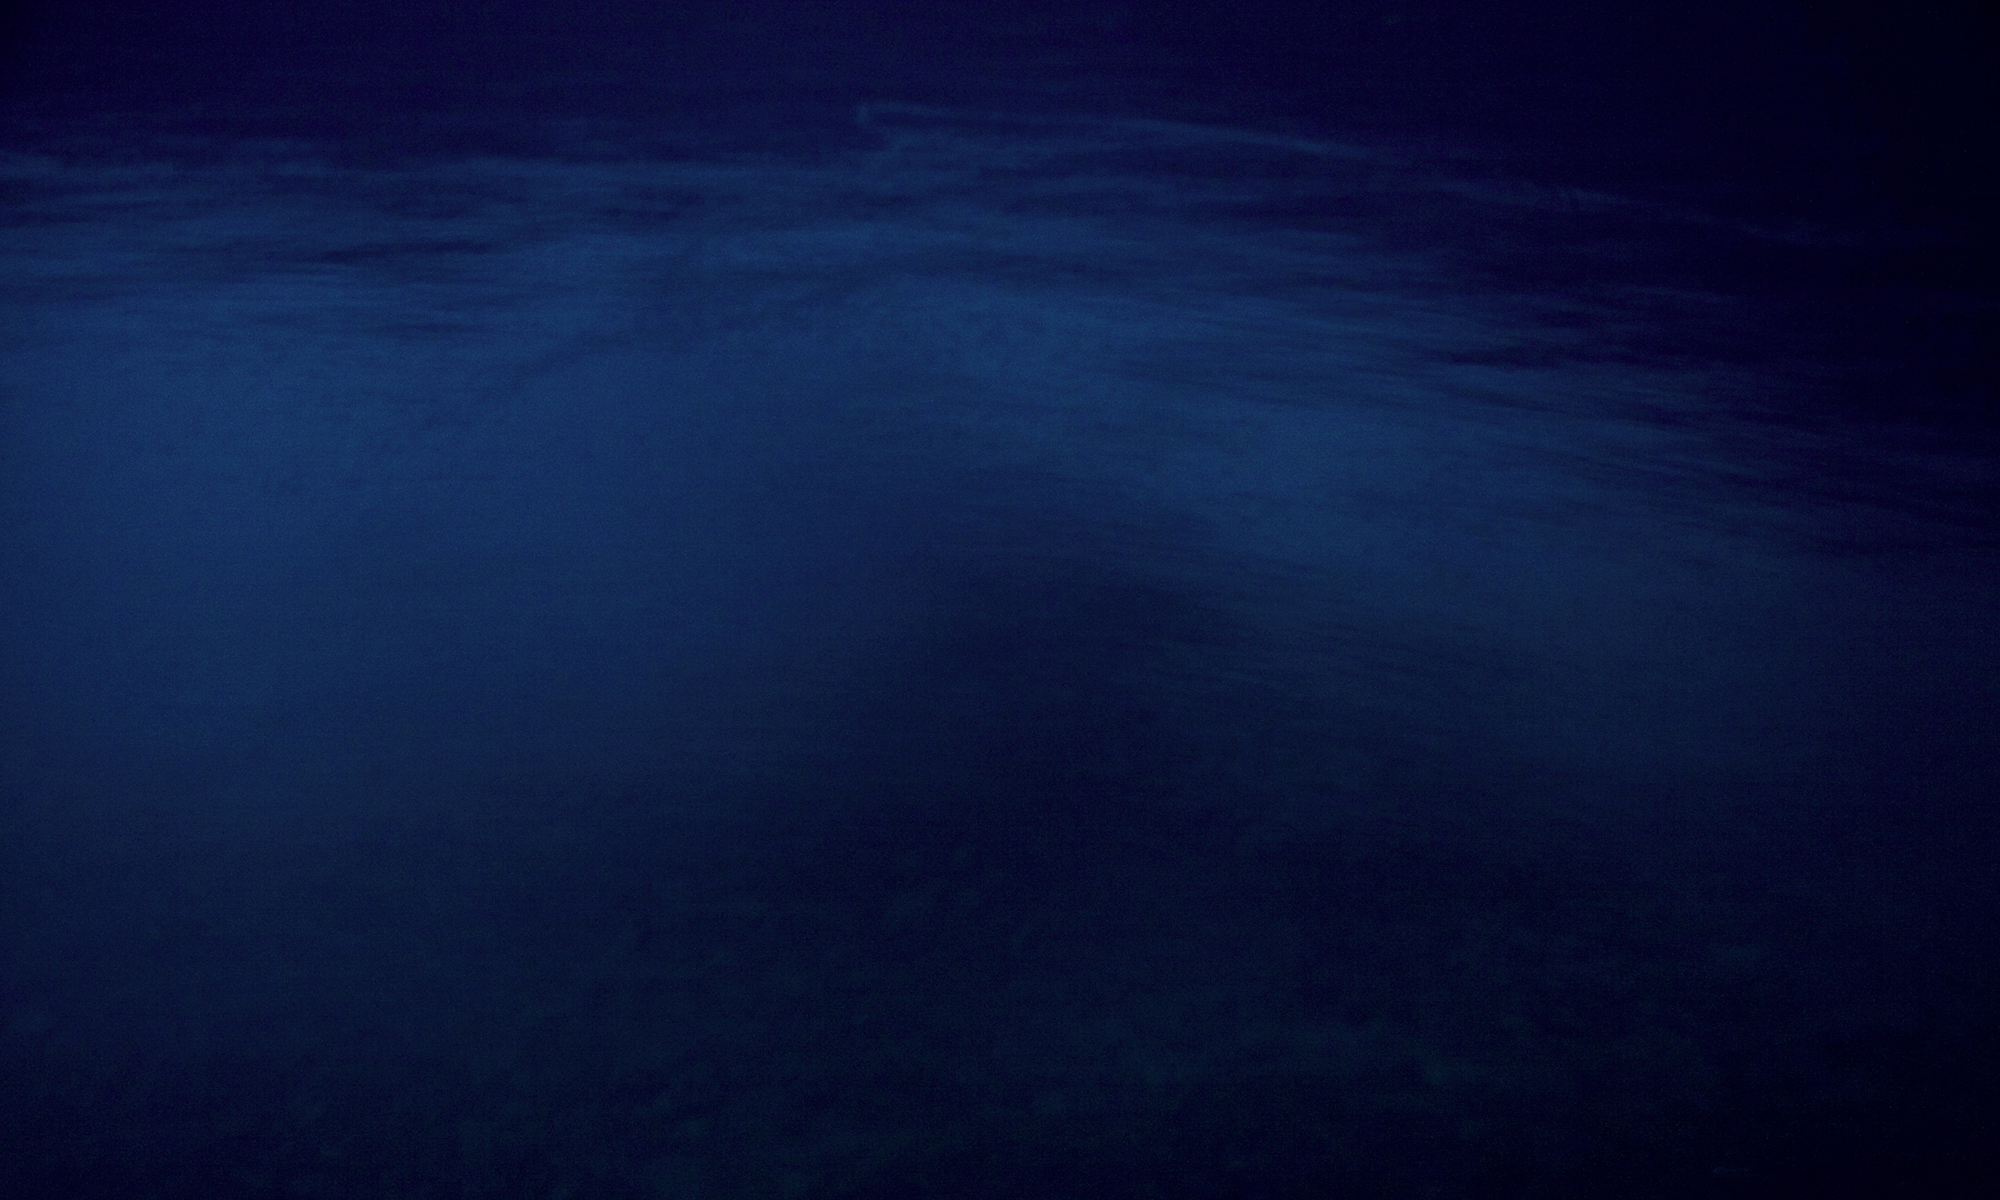 By the Bluest of Seas